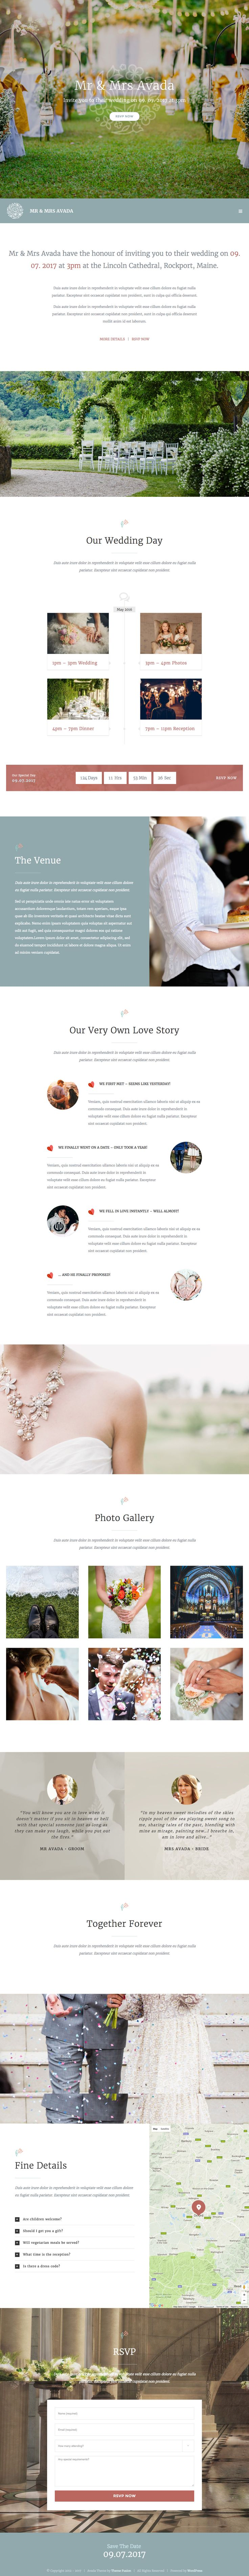 wedding invitation template themeforest%0A Avada Wedding Wordpress Theme   Template  https   themeforest net item